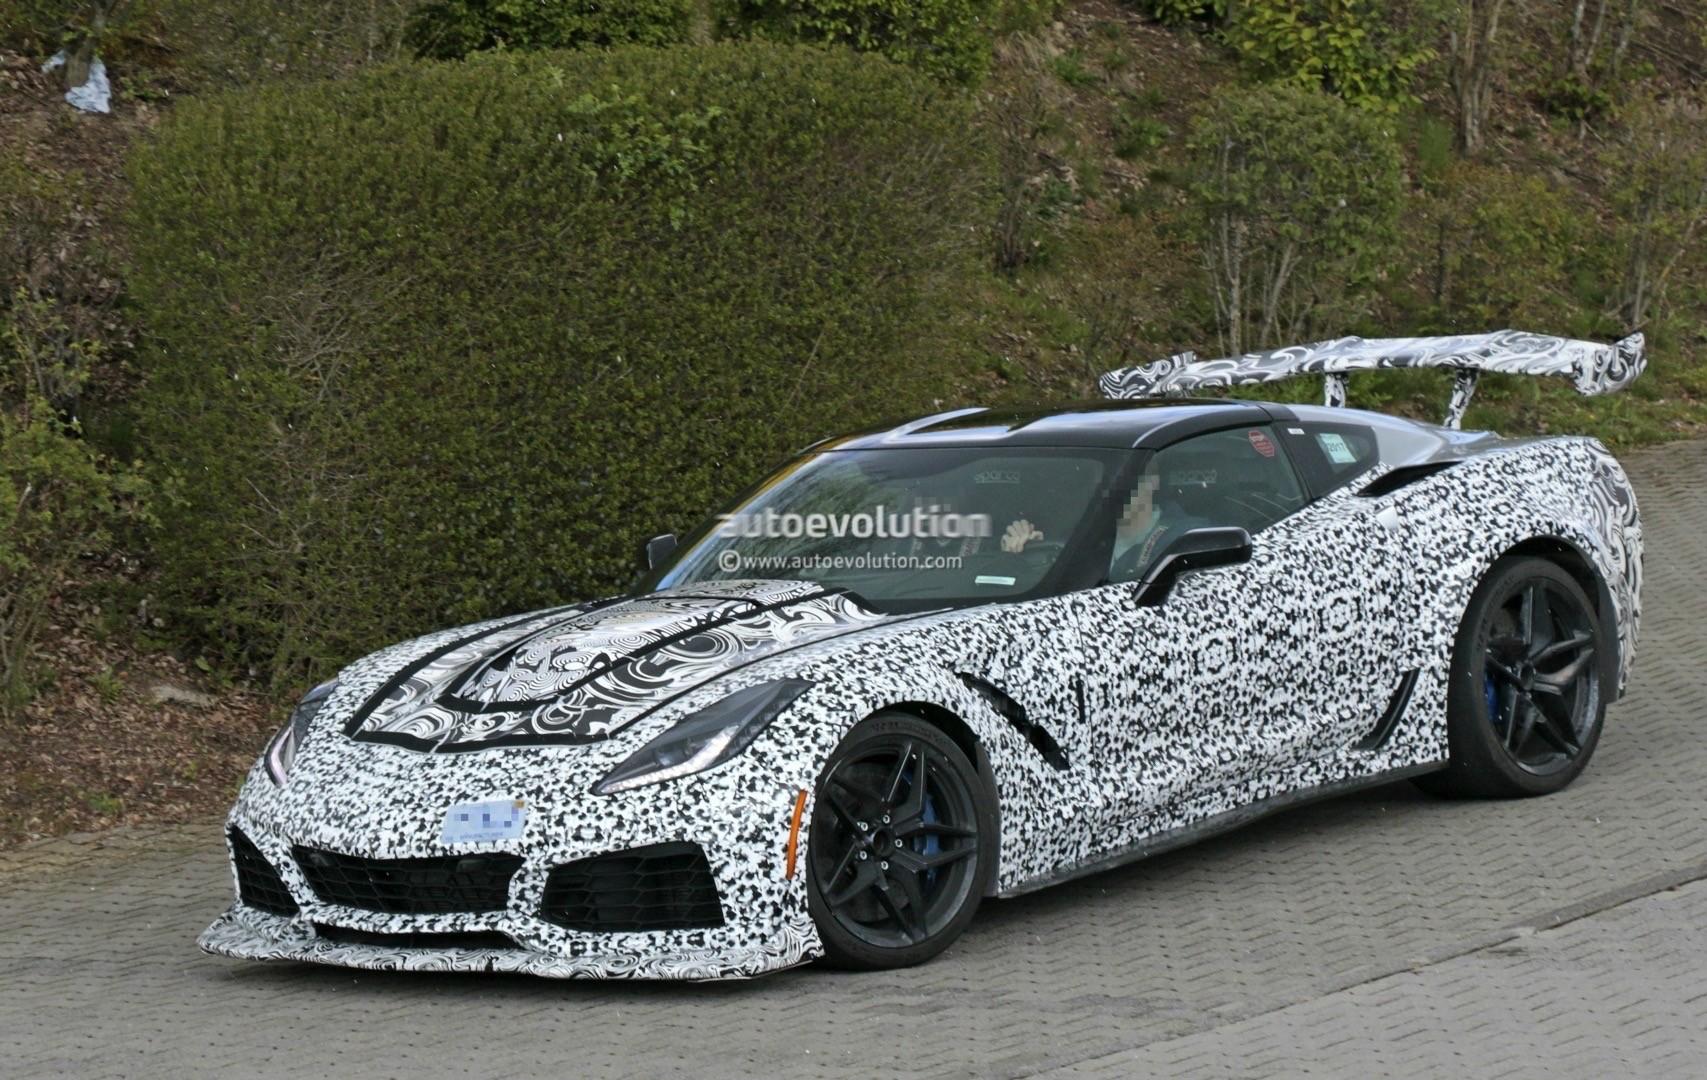 2018 Corvette Zr1 Confirmed With Supercharged Lt5 V8 Engine Autoevolution